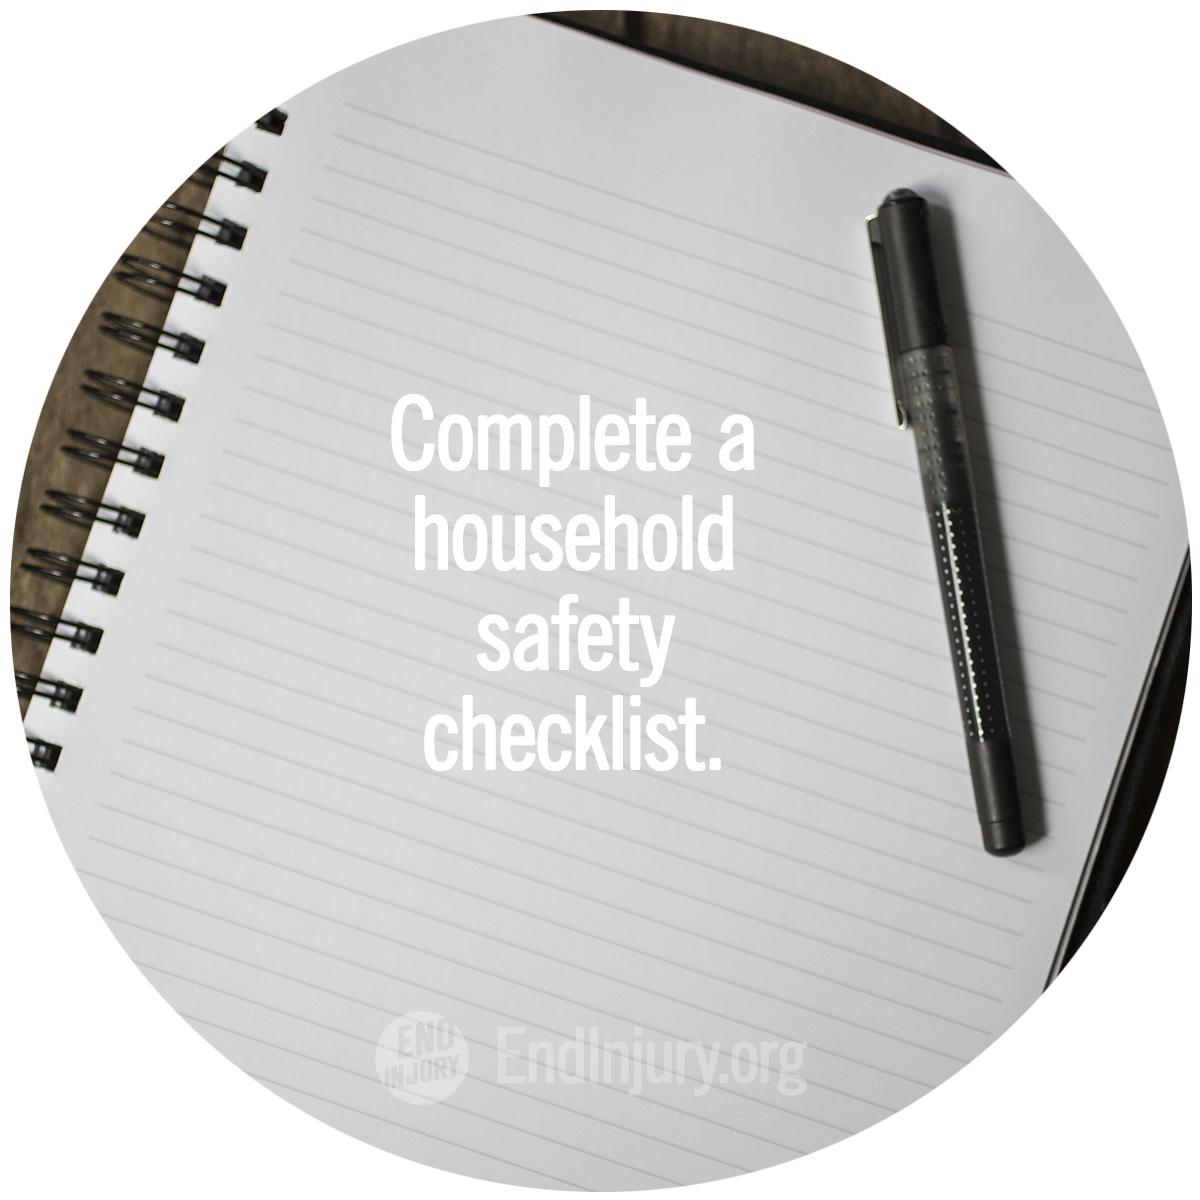 household-safety-checklist-paper.jpg